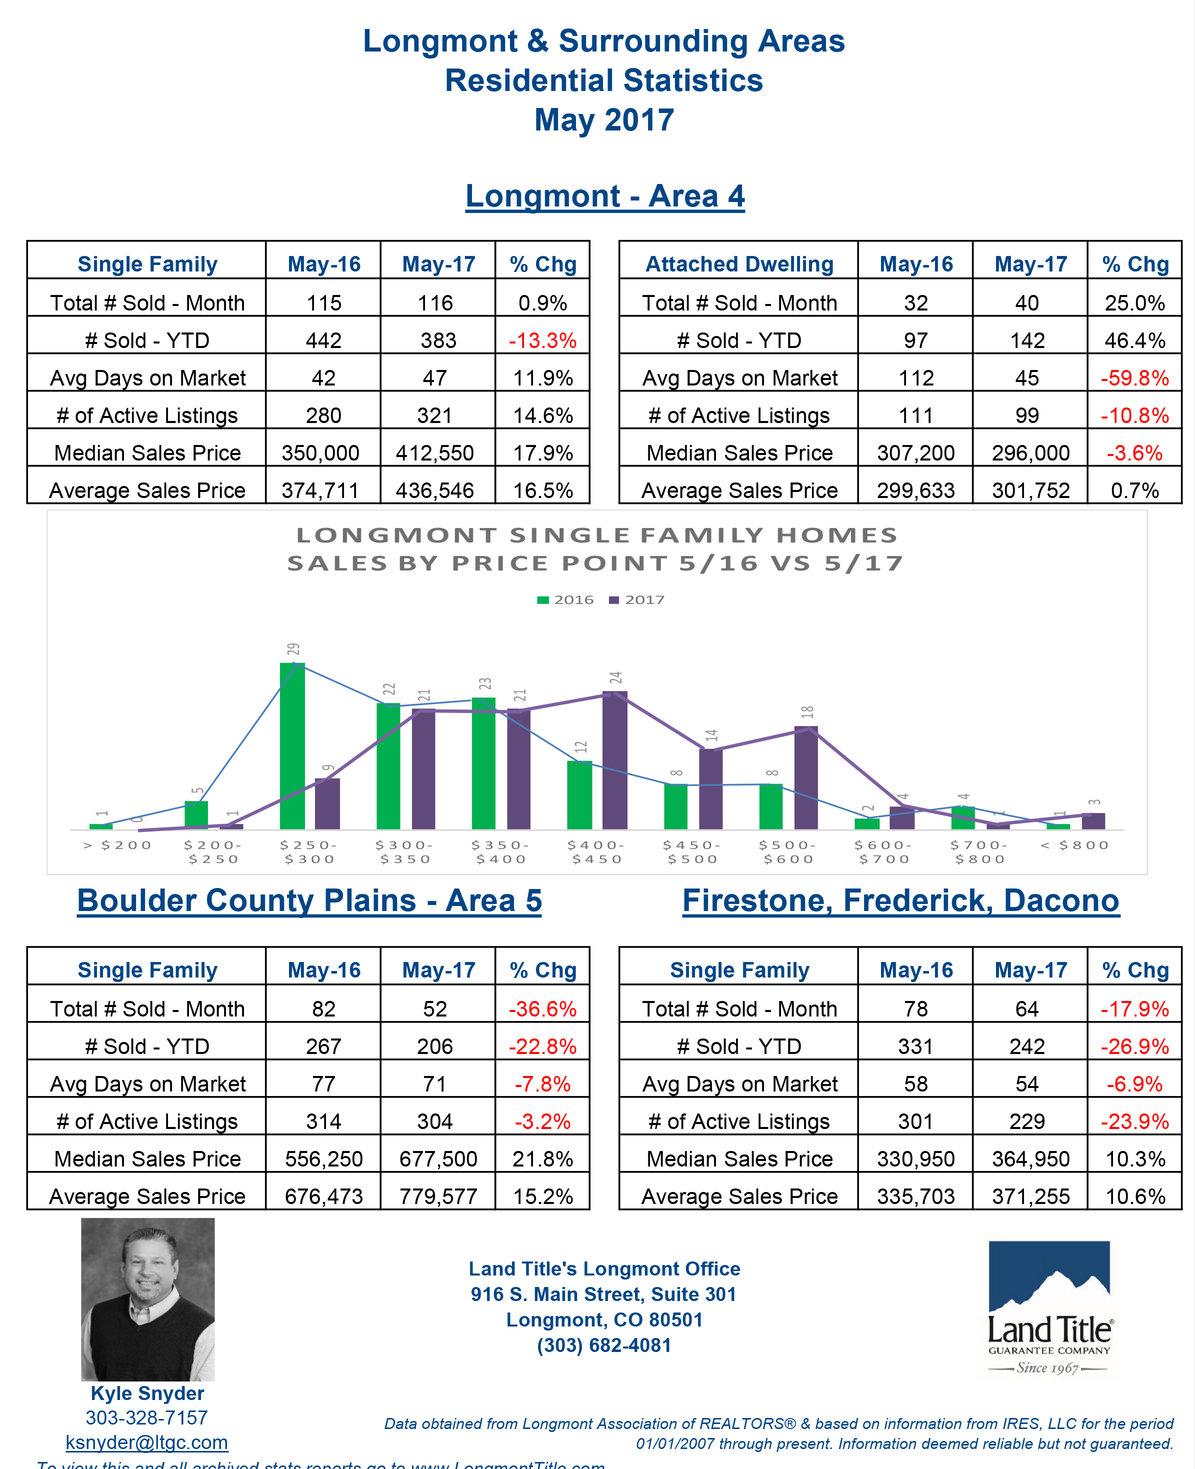 Longmont Statistics May 2017